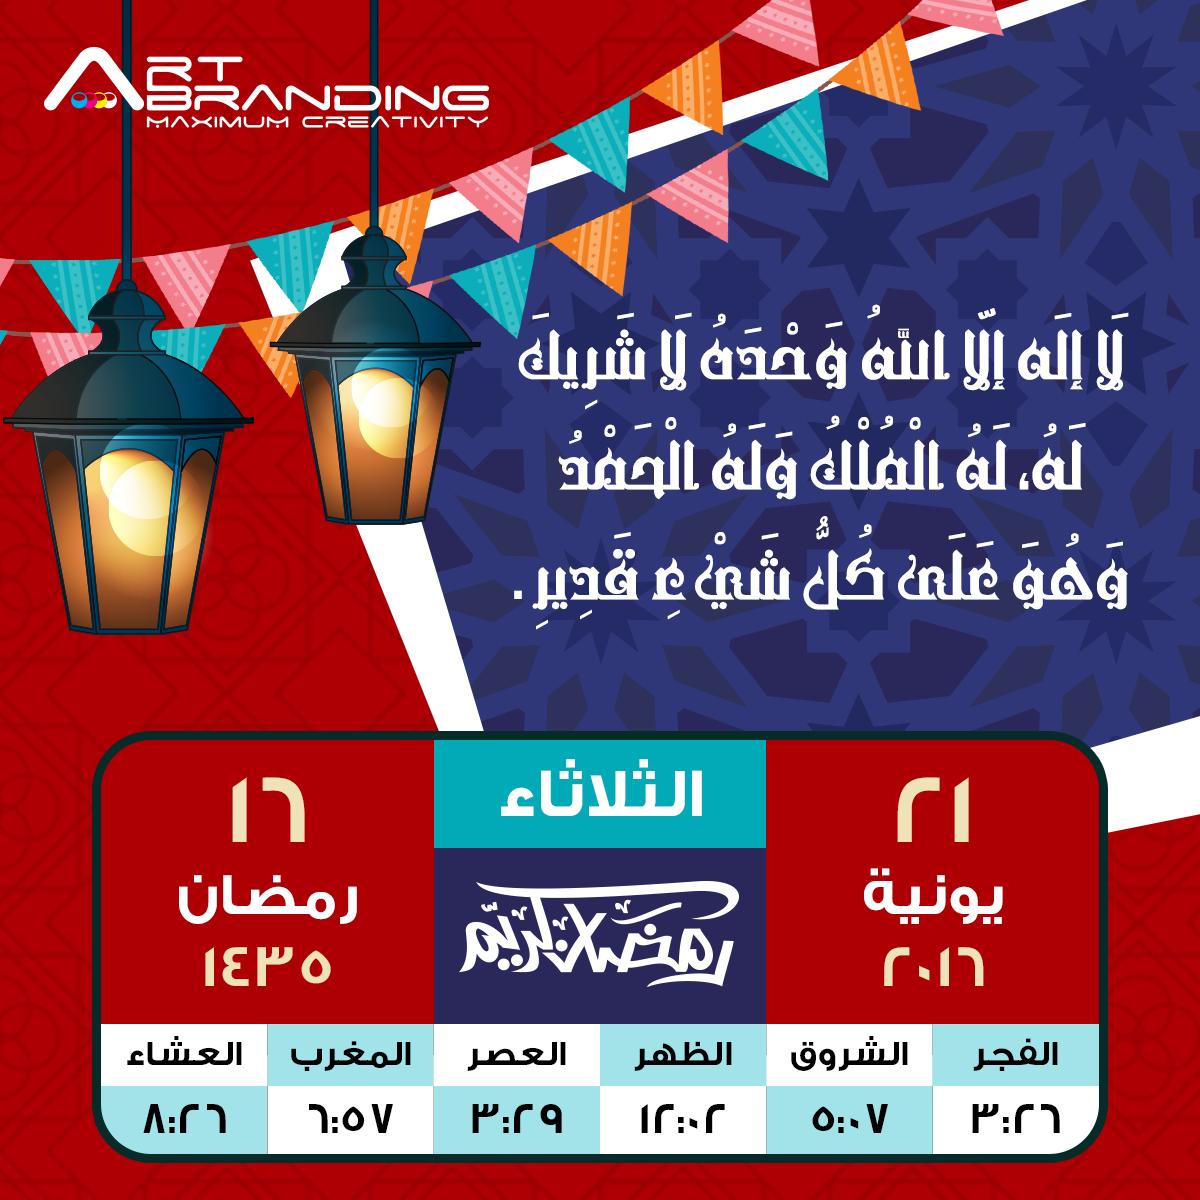 Art Branding Www Artbranding Eg Com Ramadan 2016 Branding Gaming Logos